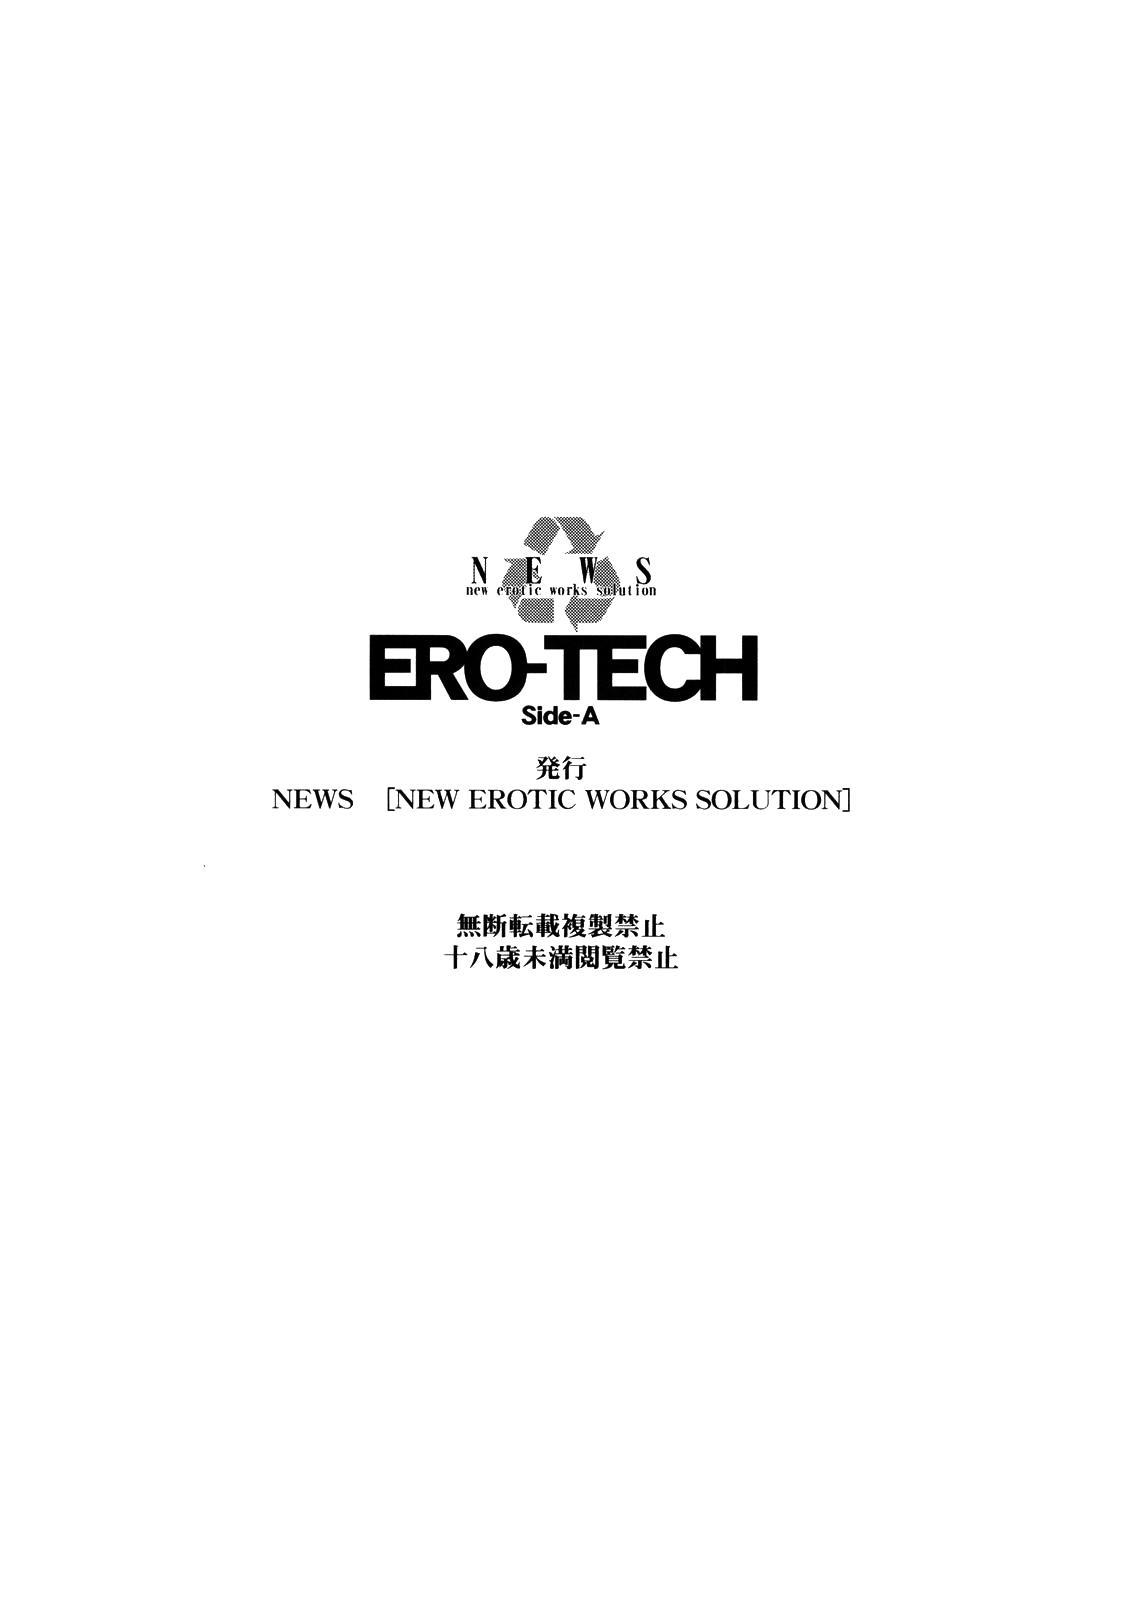 [NEWS (Akow Kazumi, COMA, Yamagata Sei)] ERO-TECH SIDE-A [Textless] 44